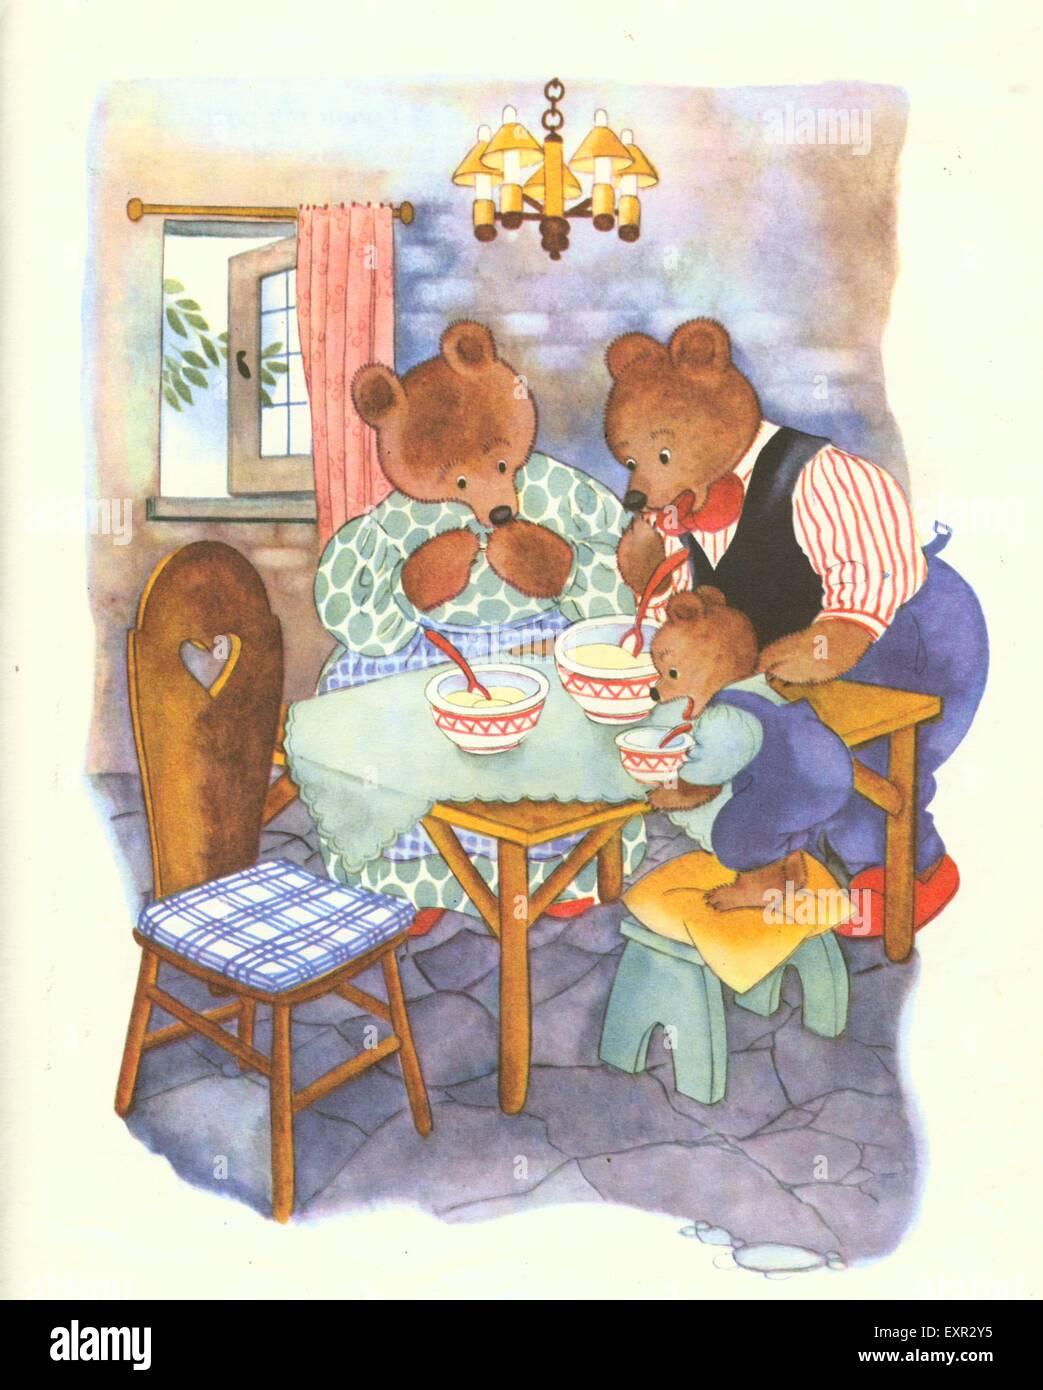 three bears porridge stock photos three bears porridge stock images alamy. Black Bedroom Furniture Sets. Home Design Ideas